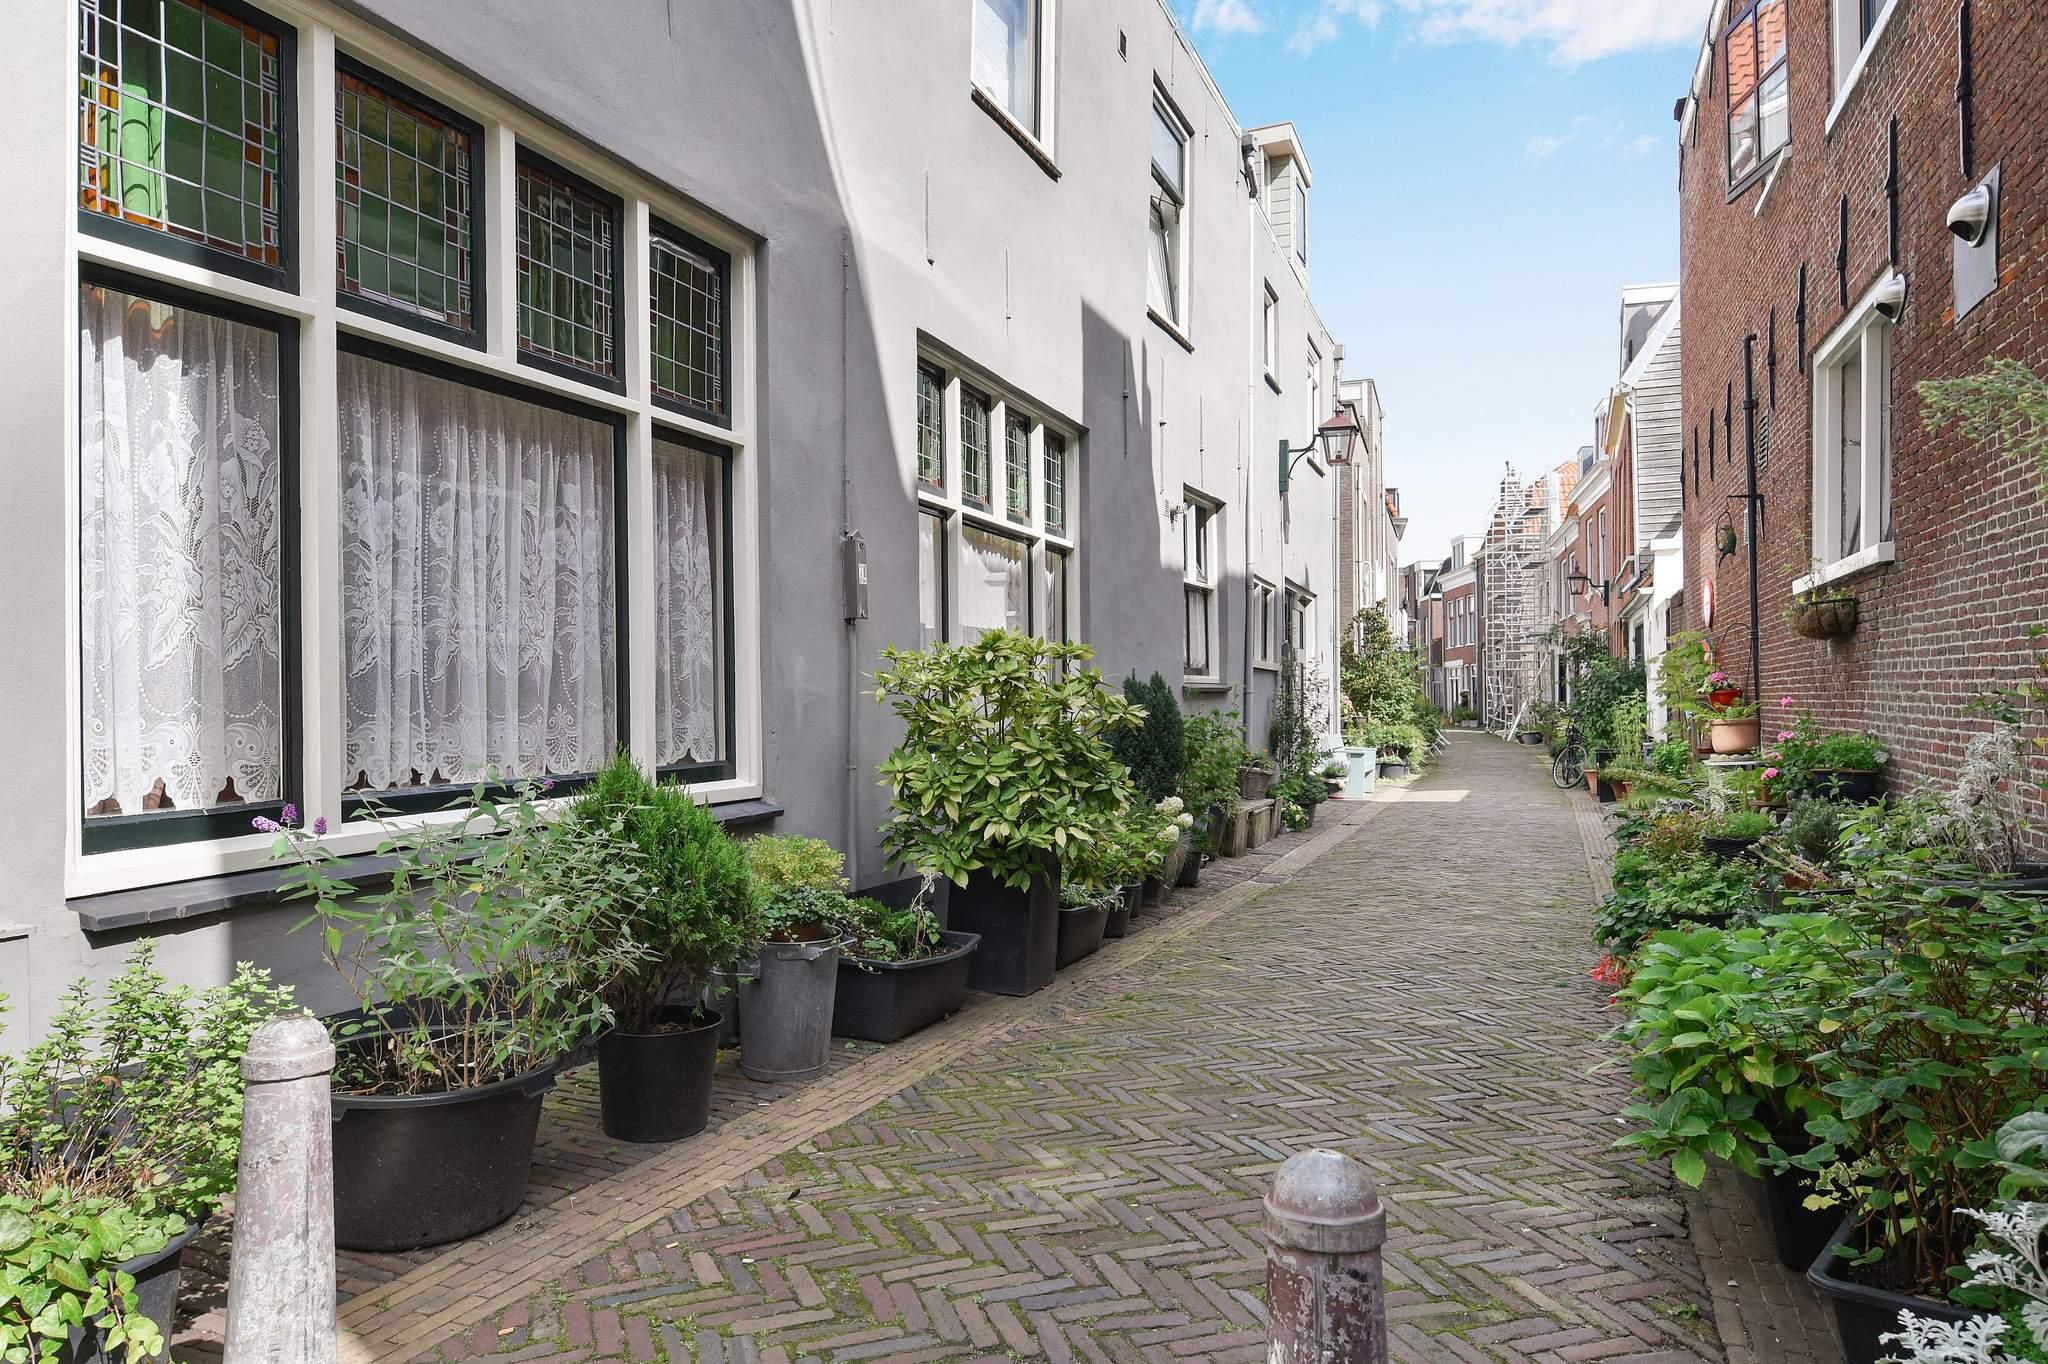 Kleine Houtstraat 105Achter, Haarlem Haarlem